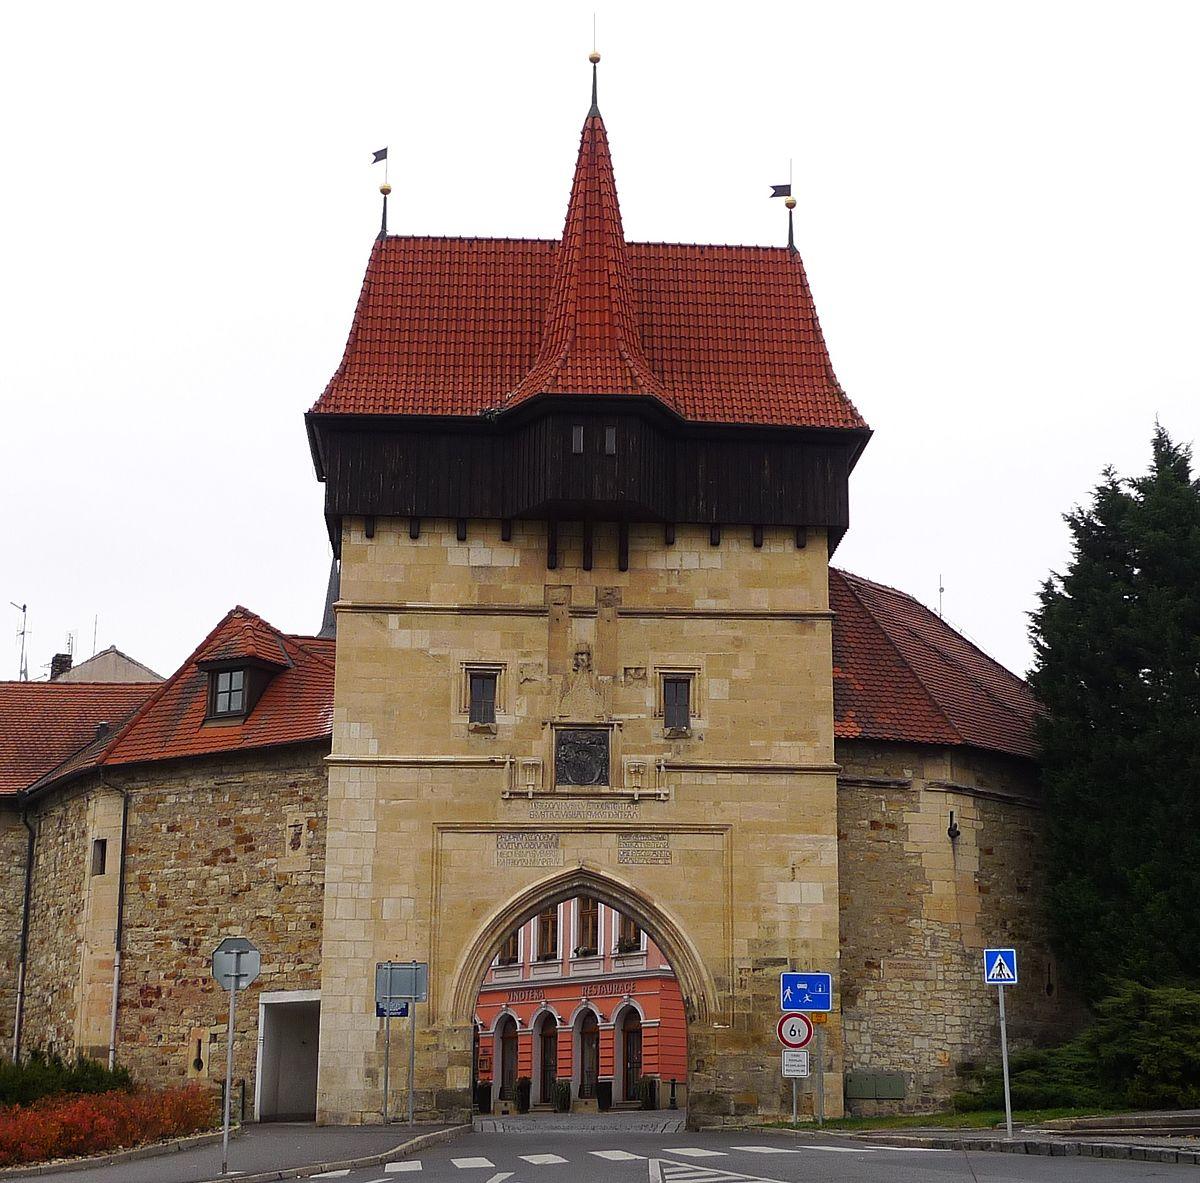 rýchlosť datovania norddeutschland